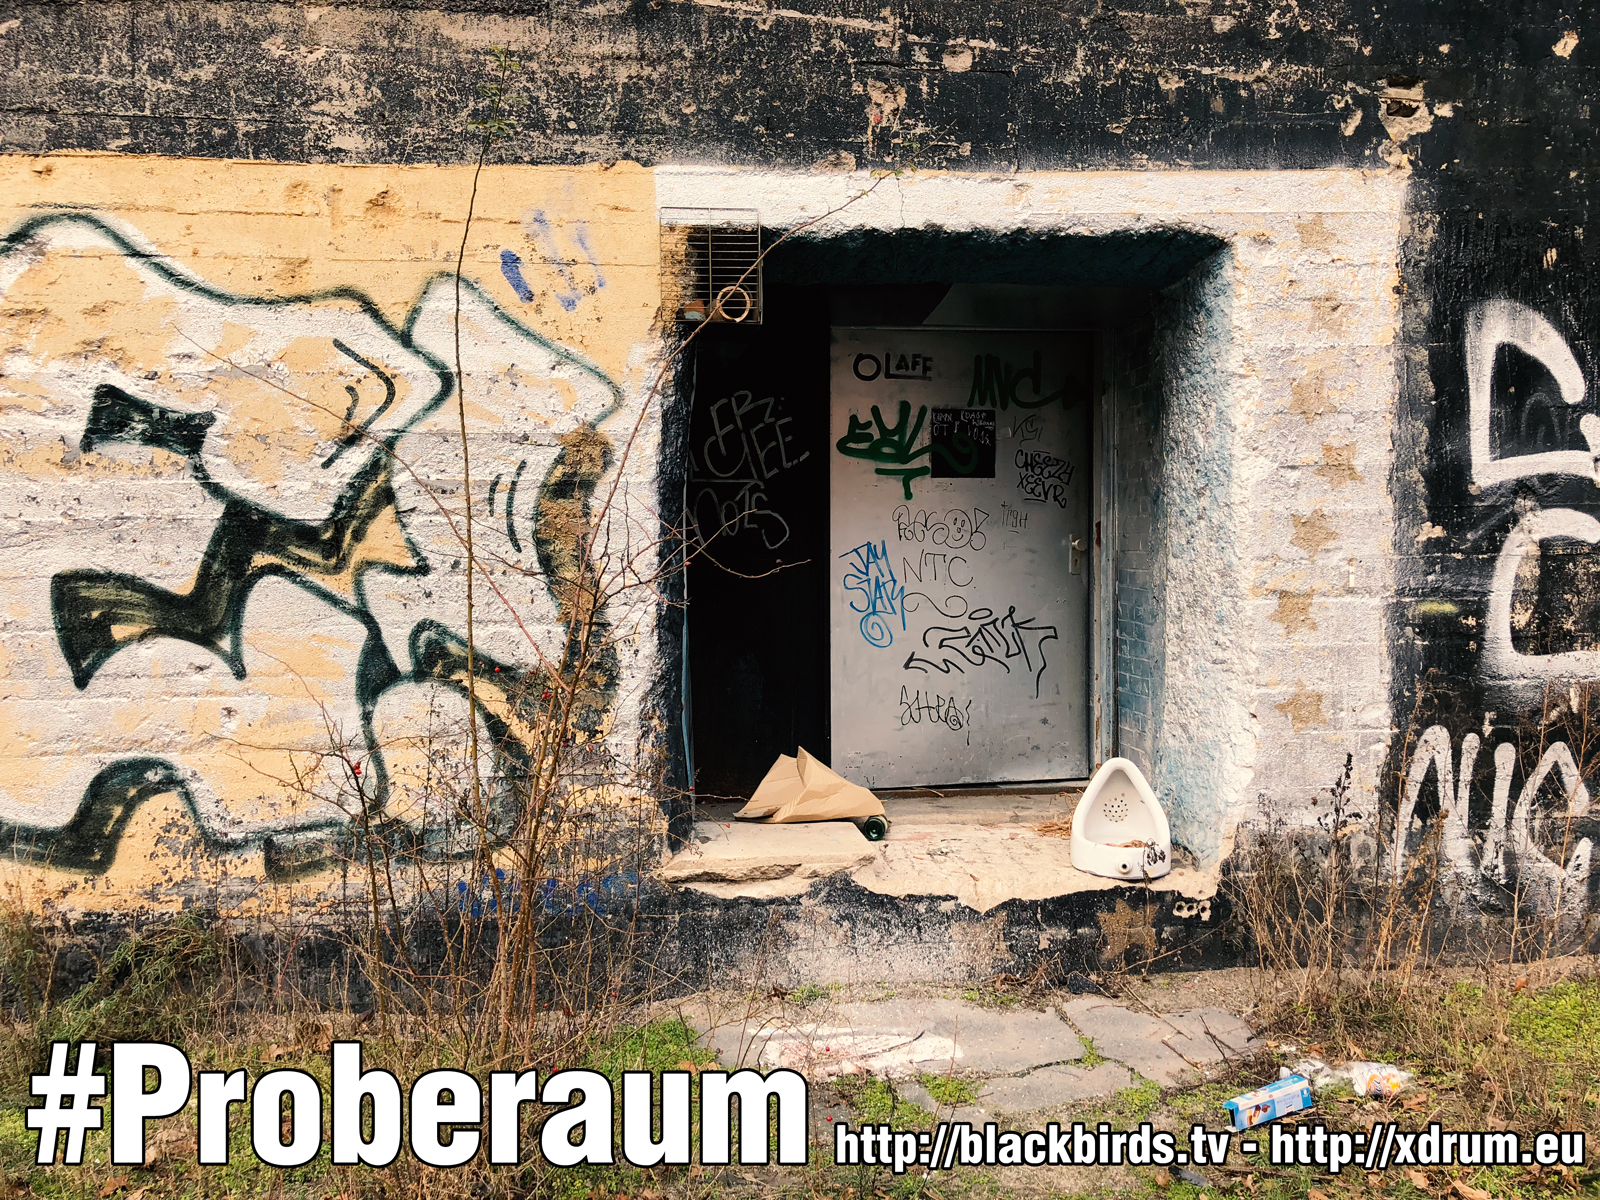 #Proberaum #Symbolbild